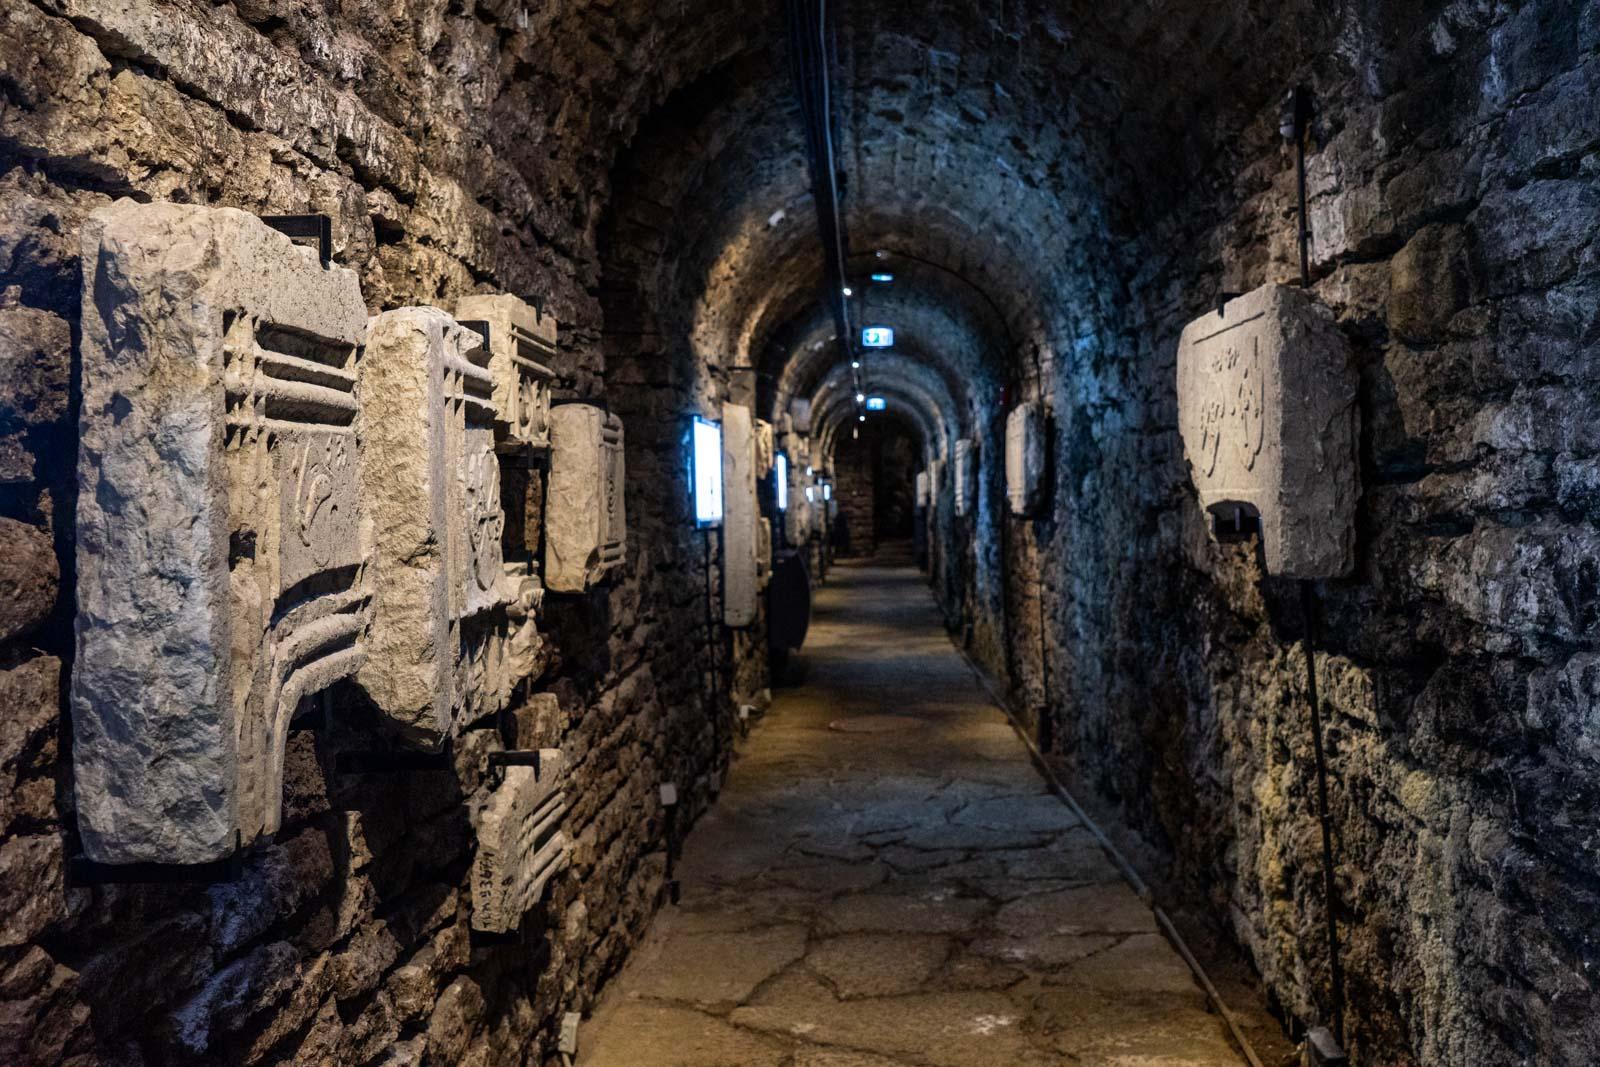 Carved Stone Museum, Tallinn, Estonia